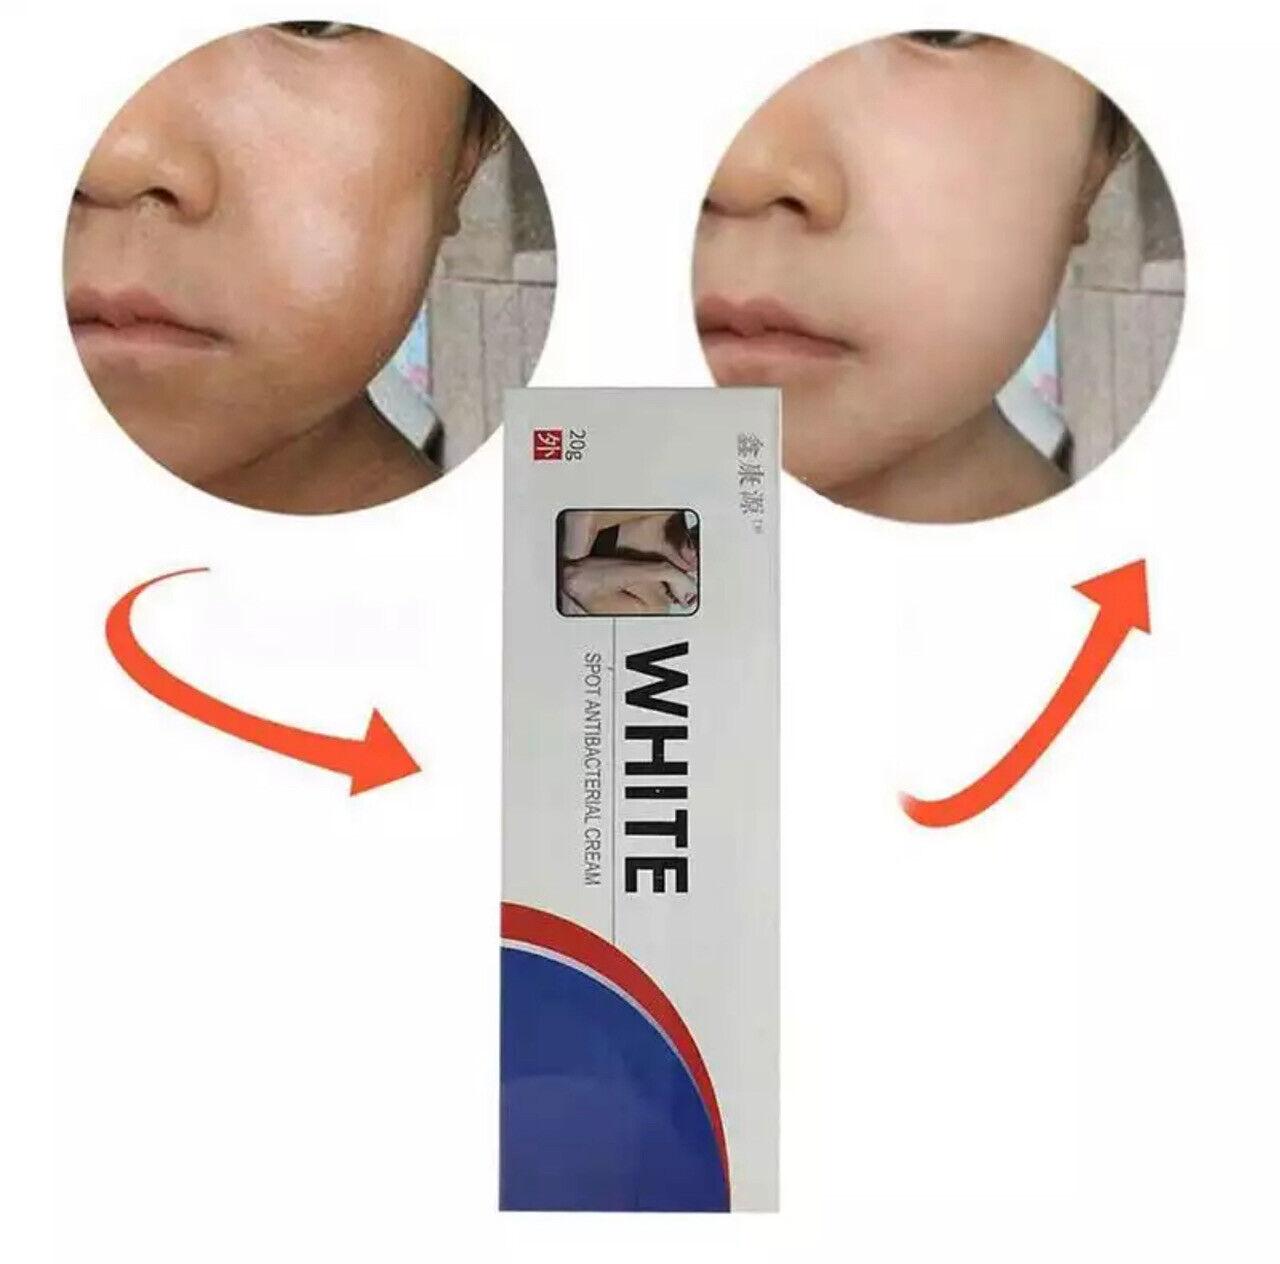 Drula Pigment Cream Vitiligo White Spots Self Tanner For Sale Online Ebay